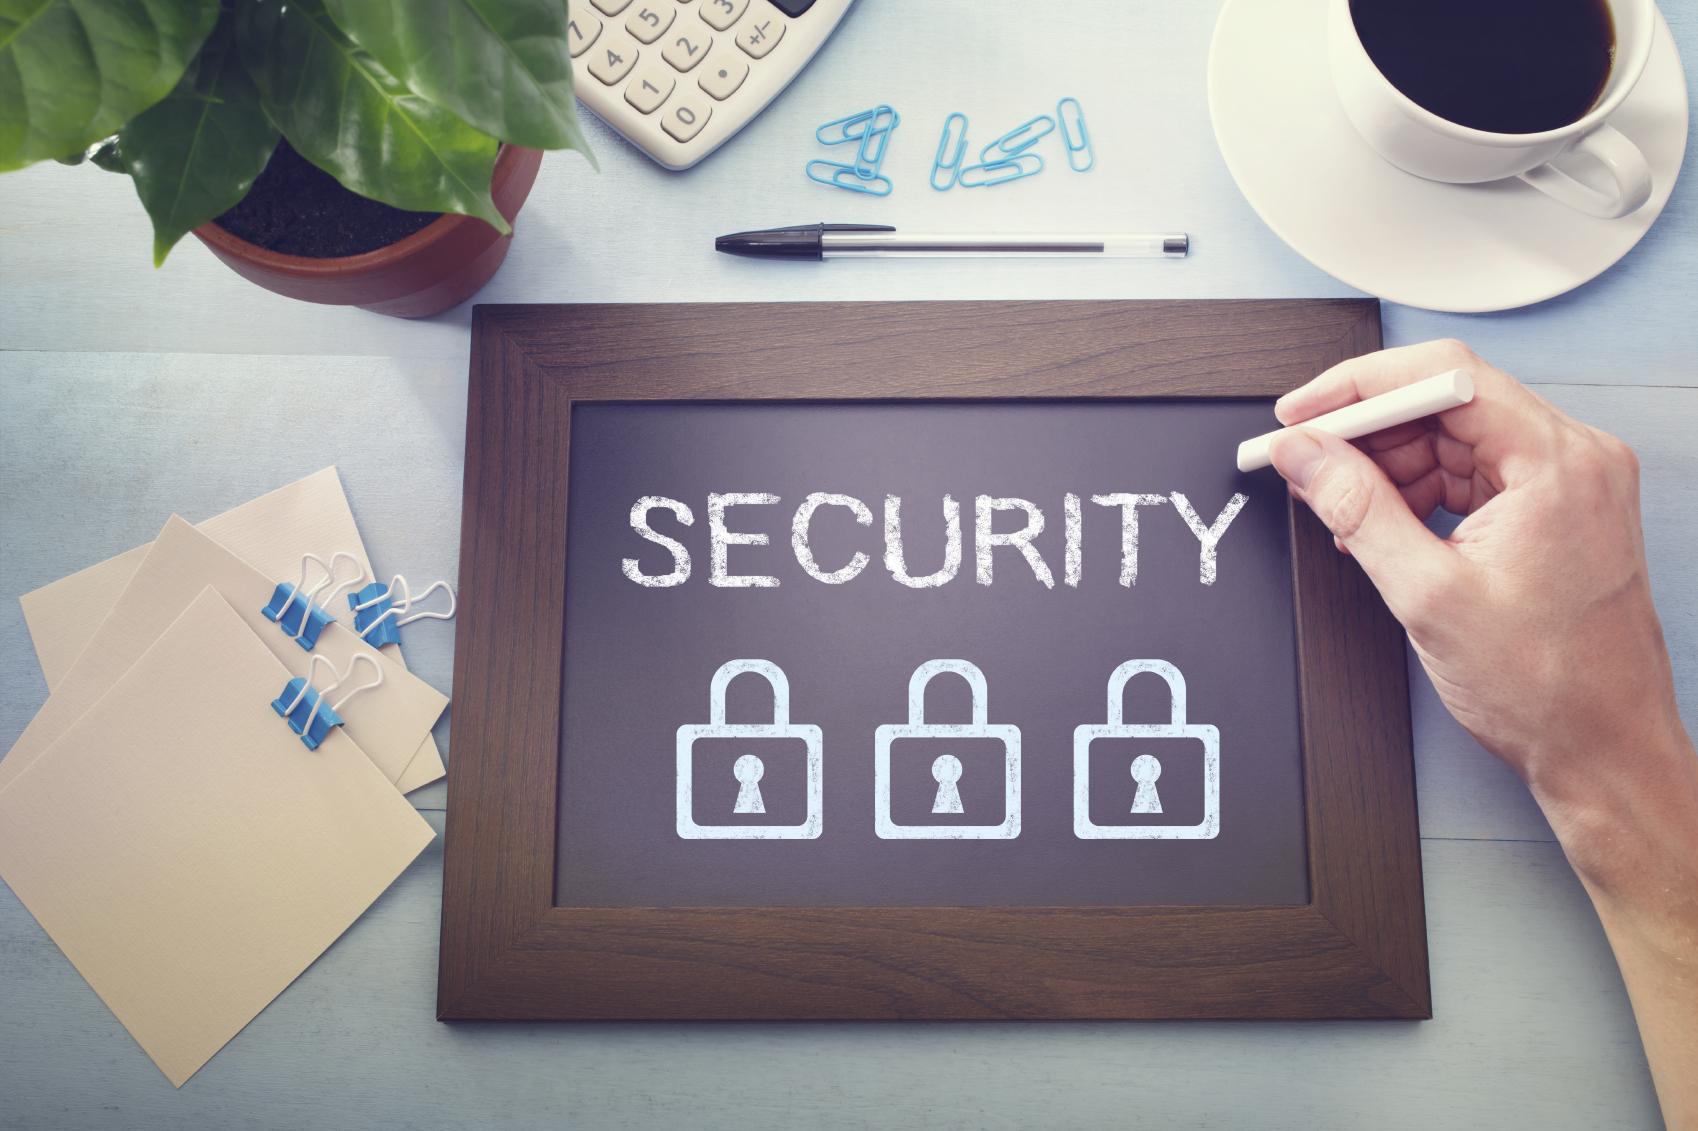 Increased Security Measures